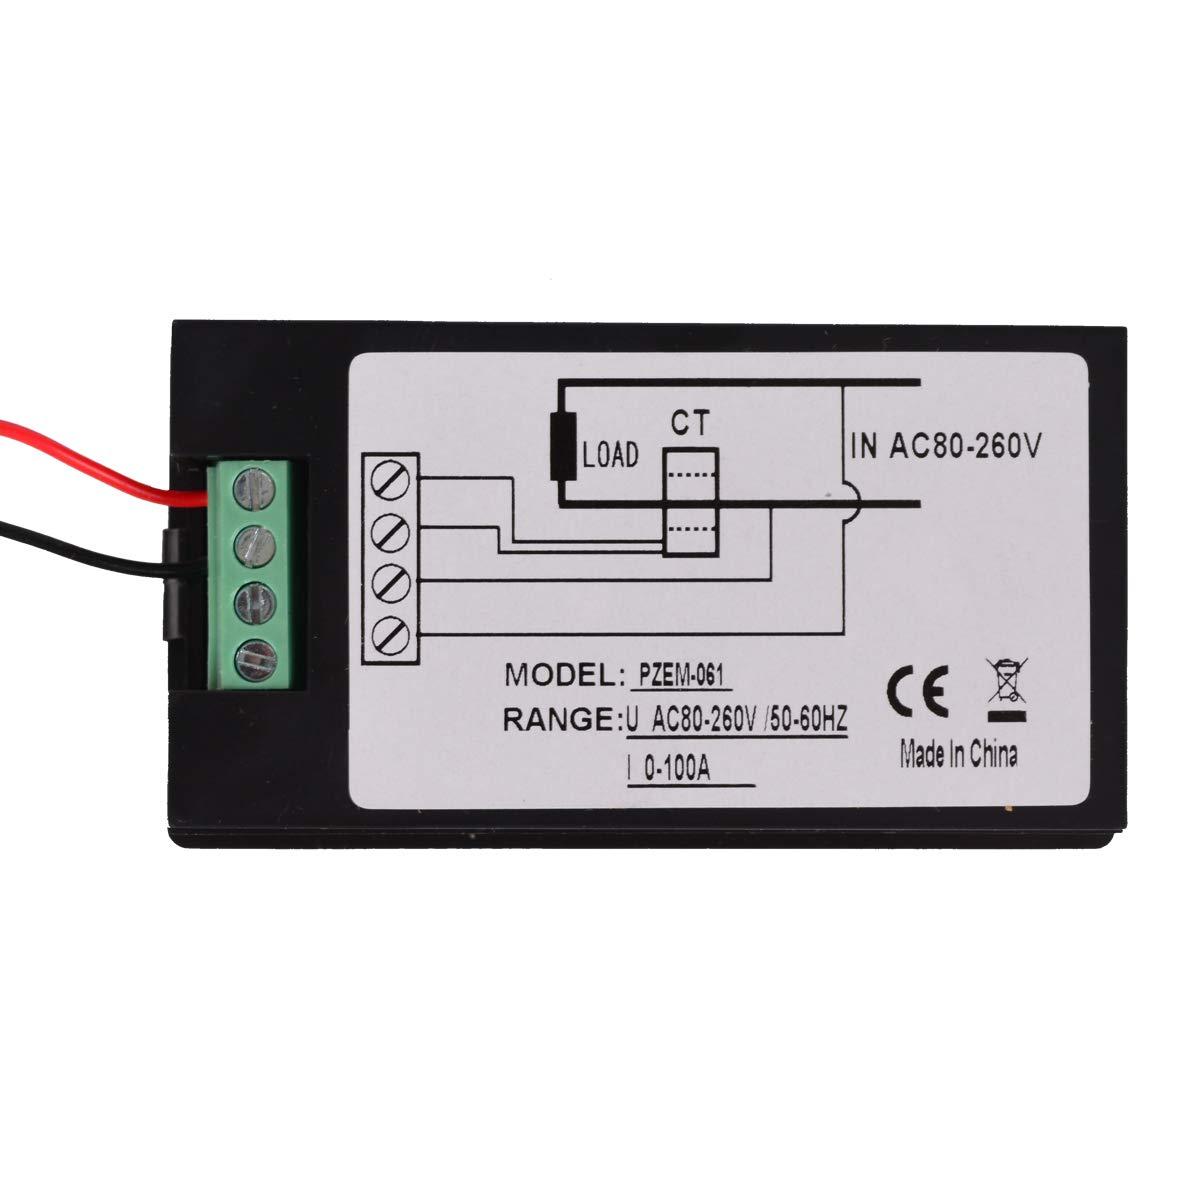 Baitaihem AC 80-260V 100A LCD Display Digital Current Voltage Power Energy Meter Multimeter Ammeter Voltmeter by Baitaihem (Image #4)